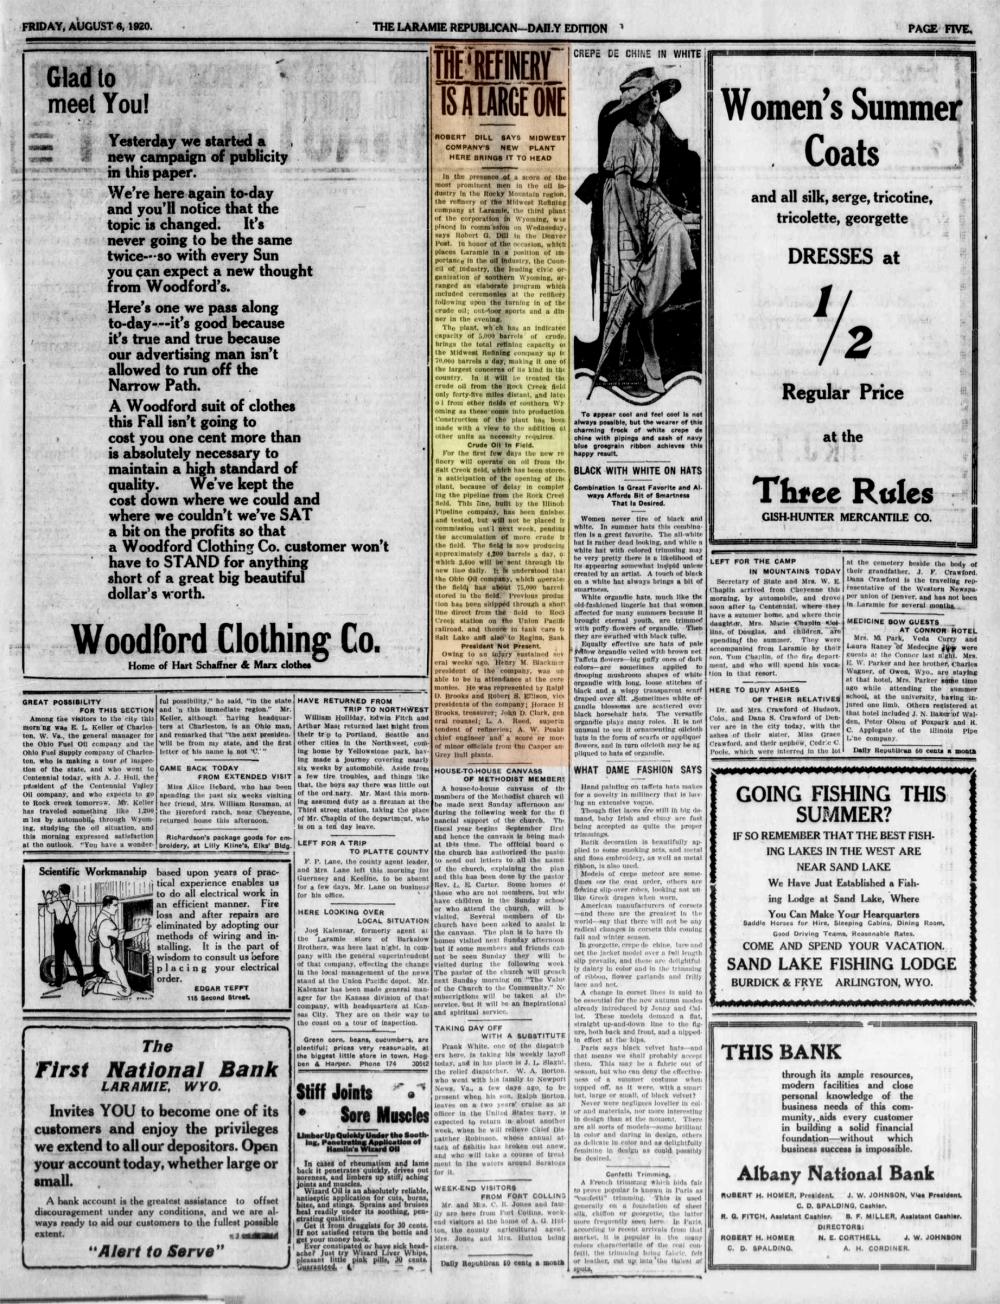 Laramie Republican 6thAugust1920, page 5.